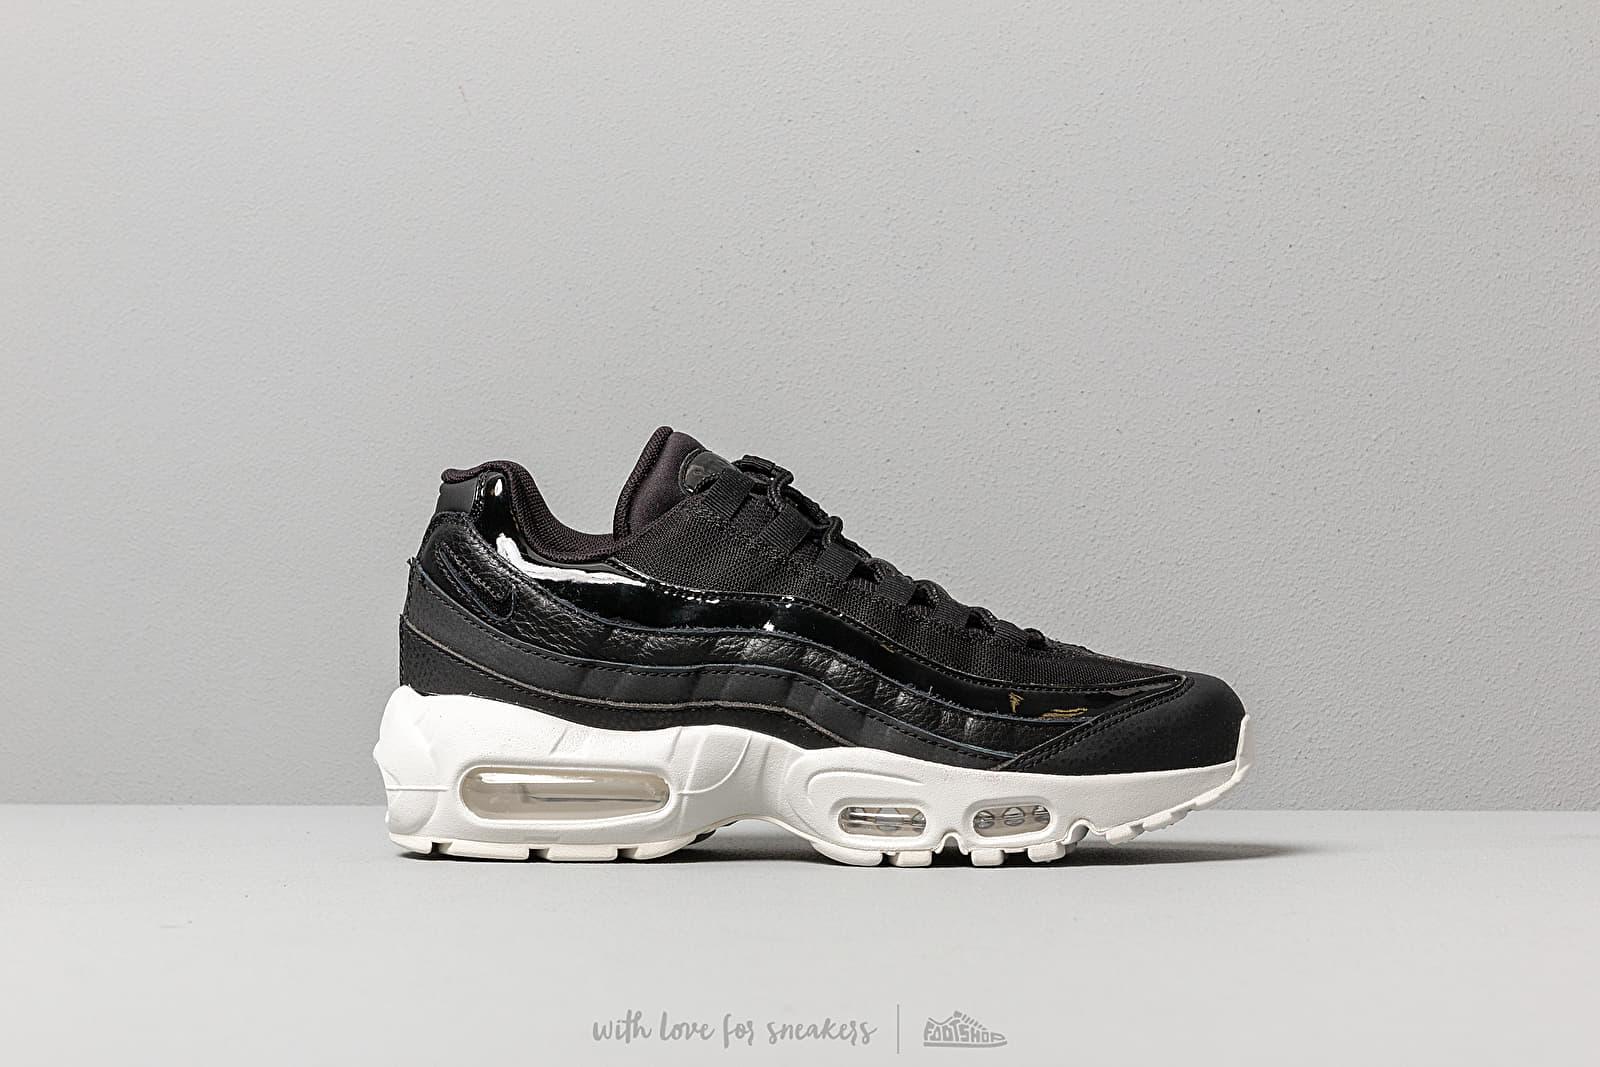 c7712b87c851b Nike Wmns Air Max 95 Se Black/ Black-Summit White-Platinum Tint ...